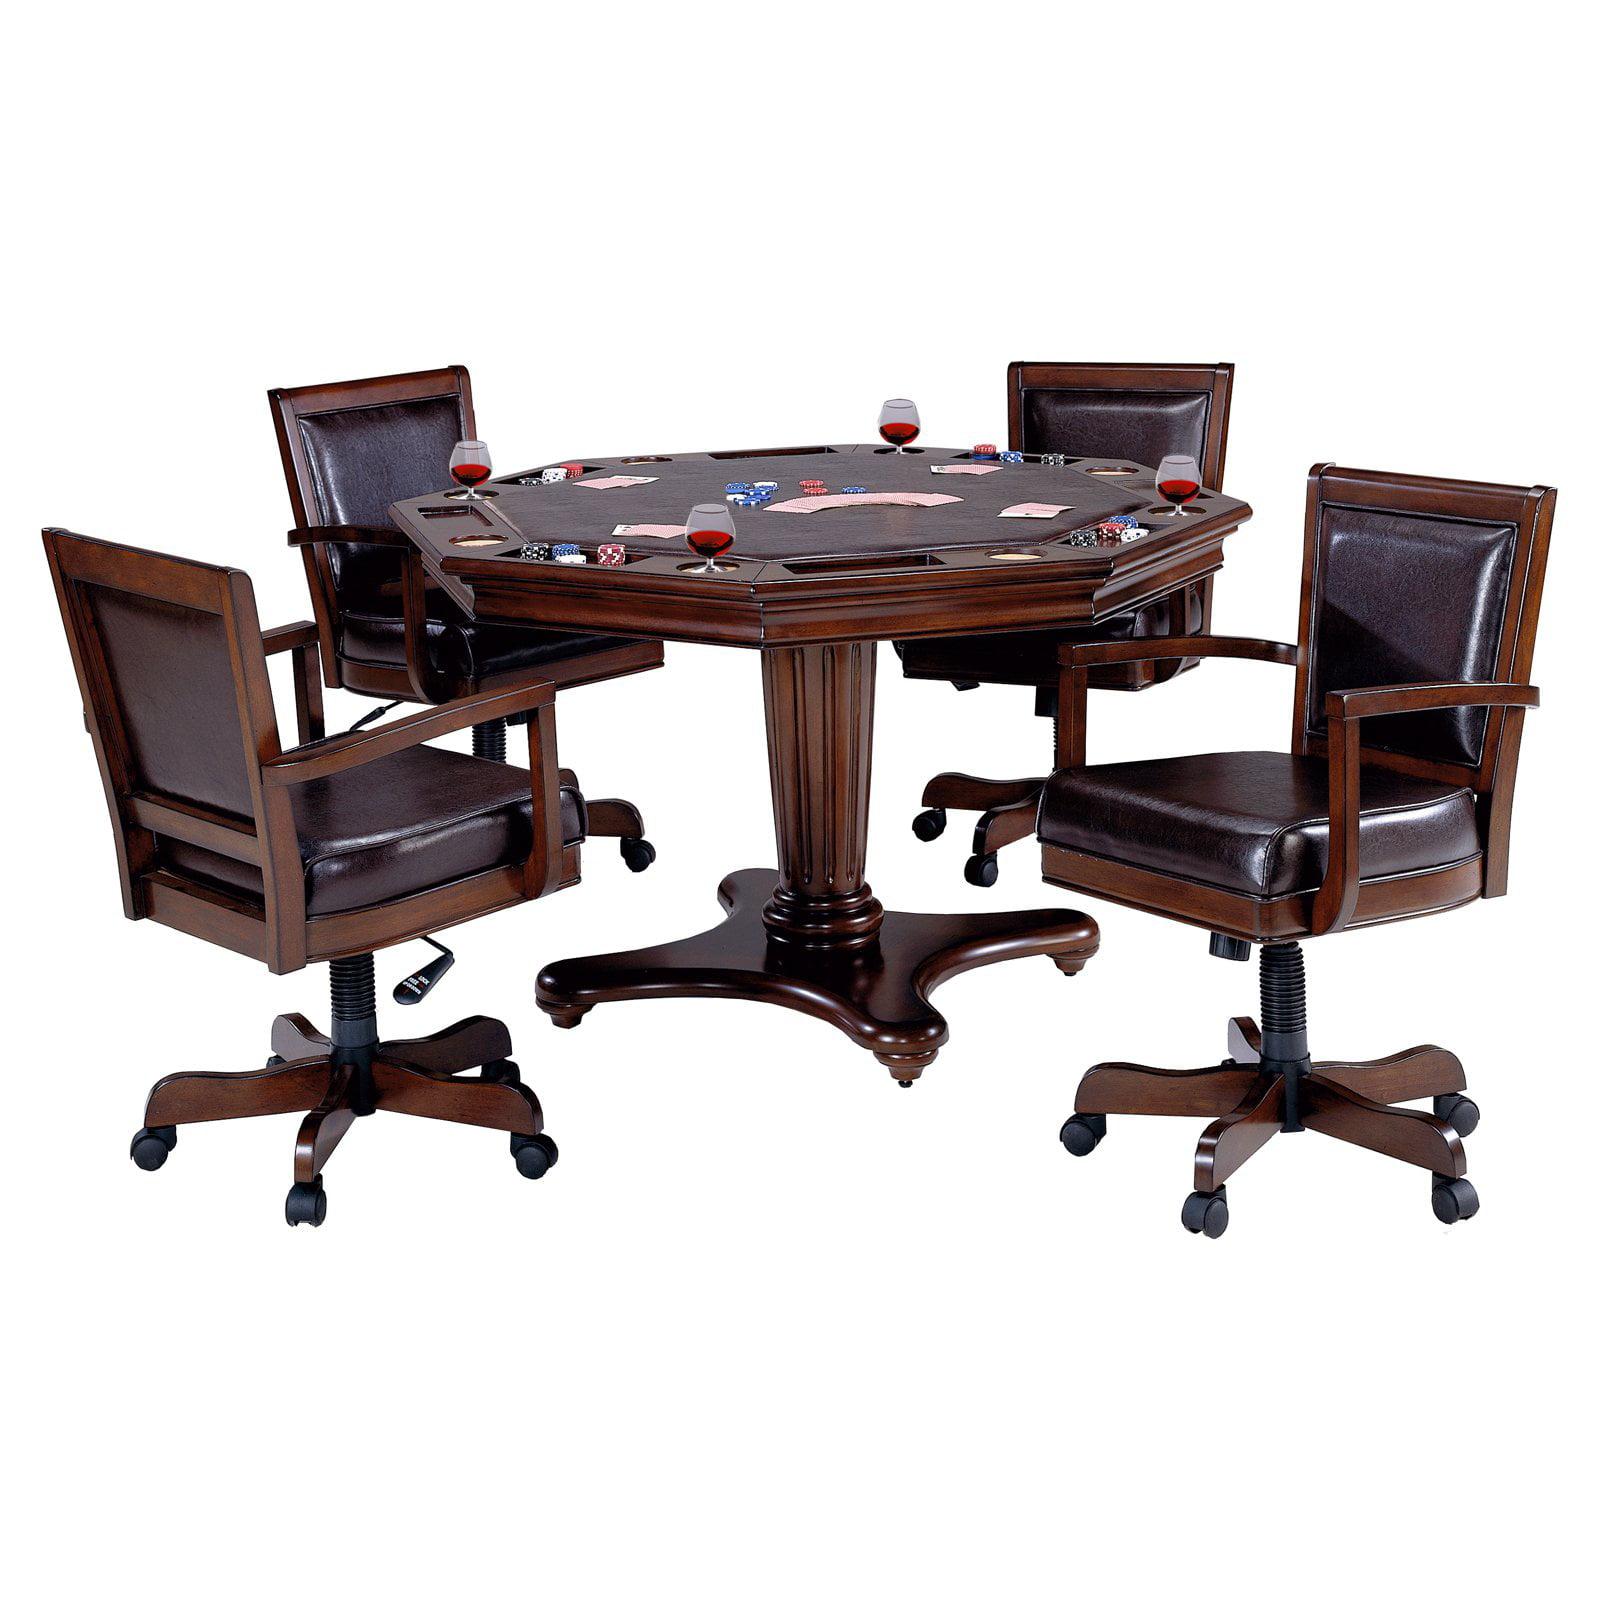 Hillsdale Ambassador 5 Piece Game Table Set